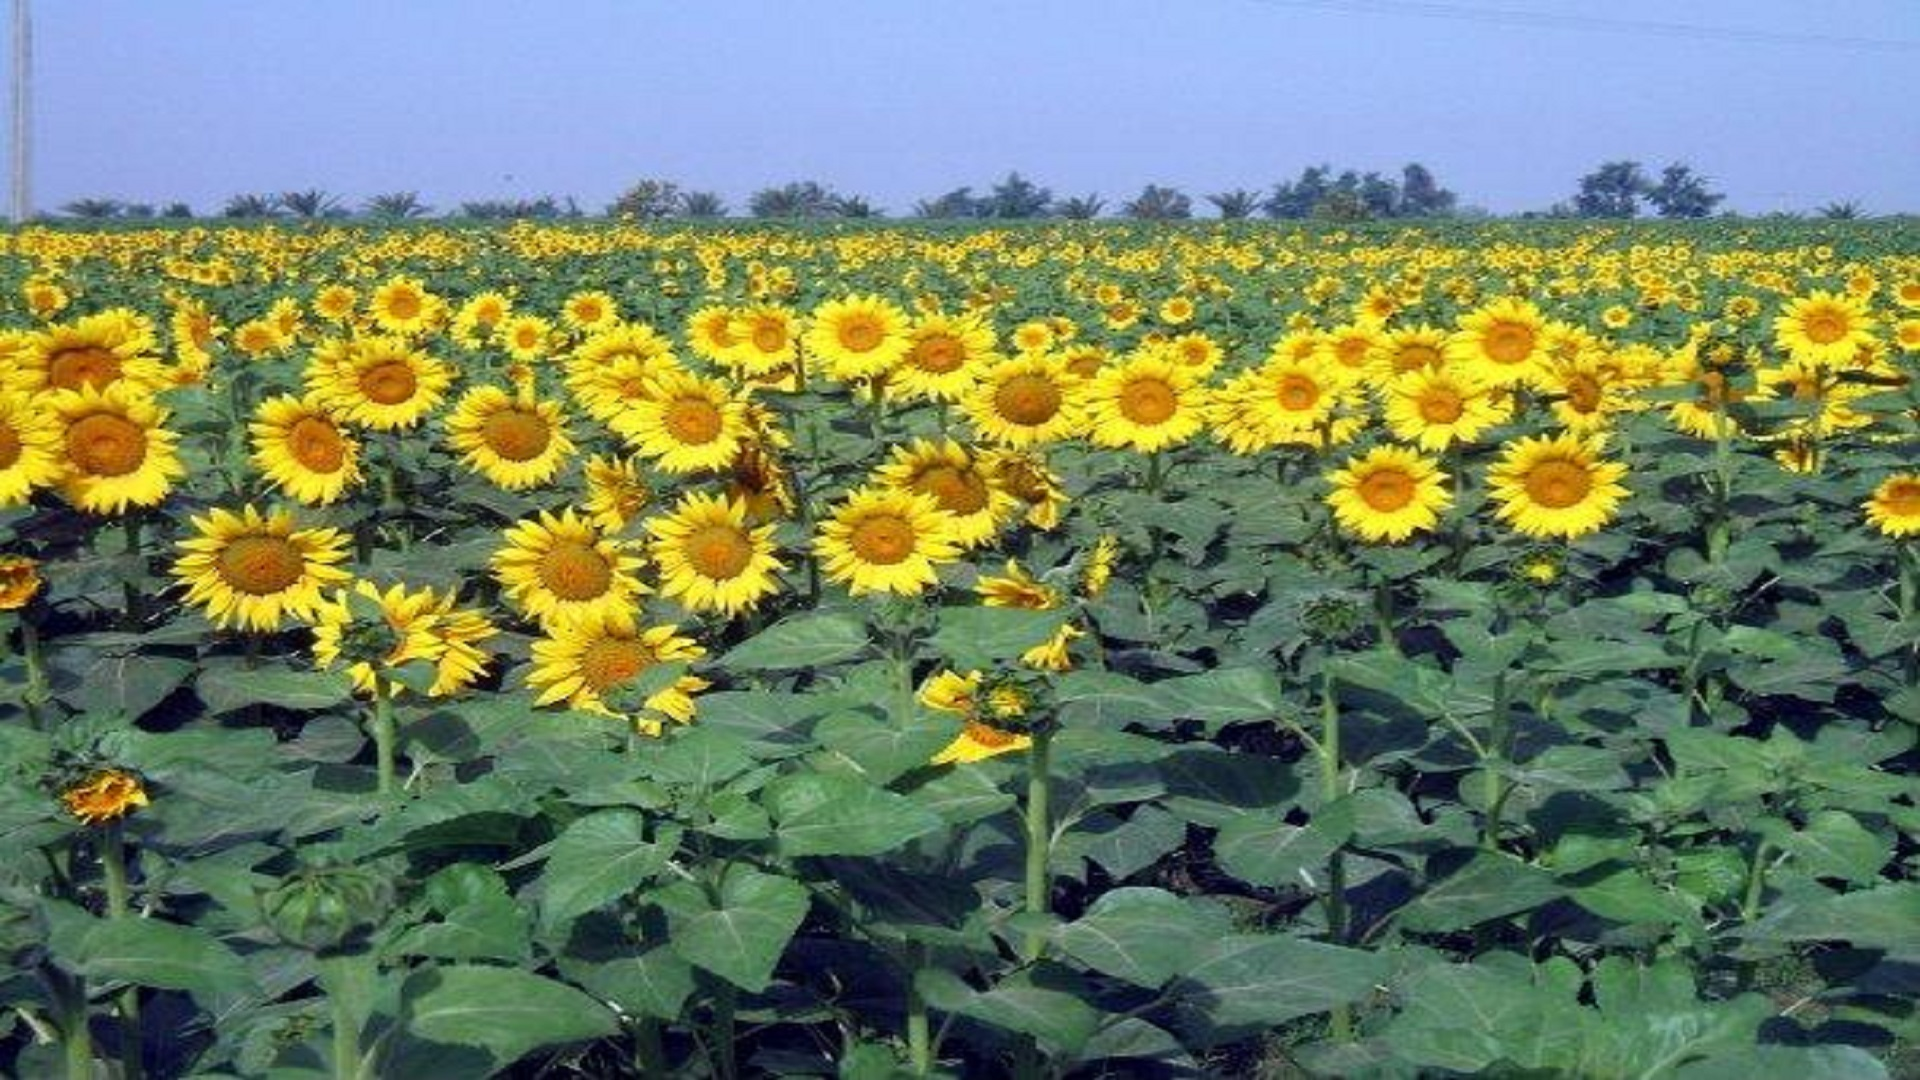 Free beautiful sun flowers hd wallpapers hd wallpaper free beautiful sun flowers hd wallpapers izmirmasajfo